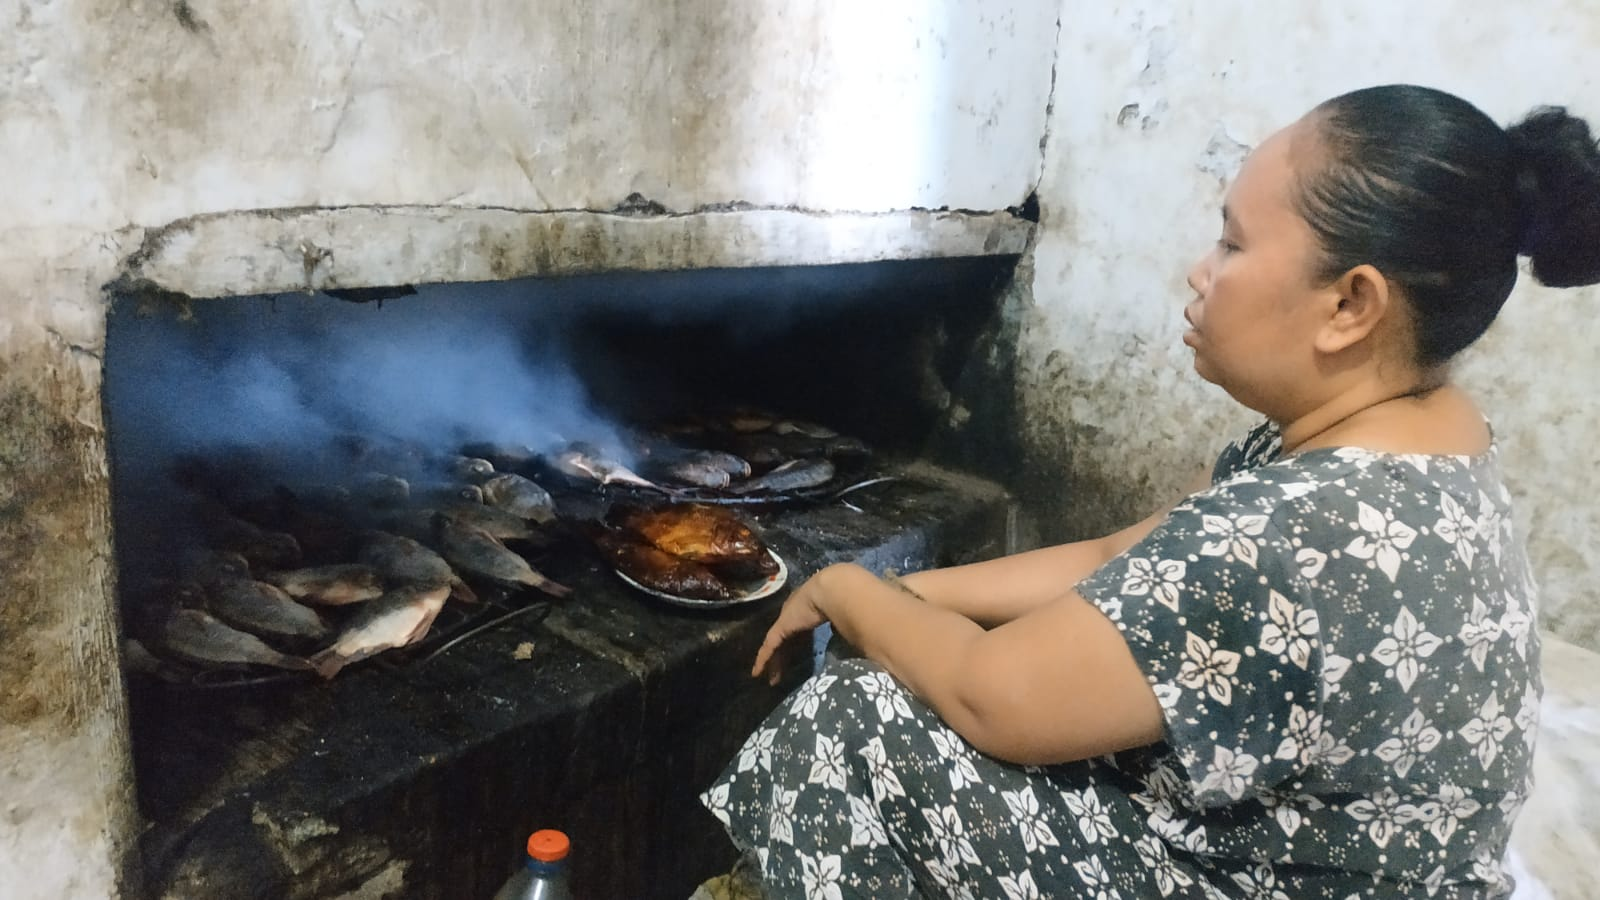 Proses pengasapan ikan di Kampung Asap, Pasuruan